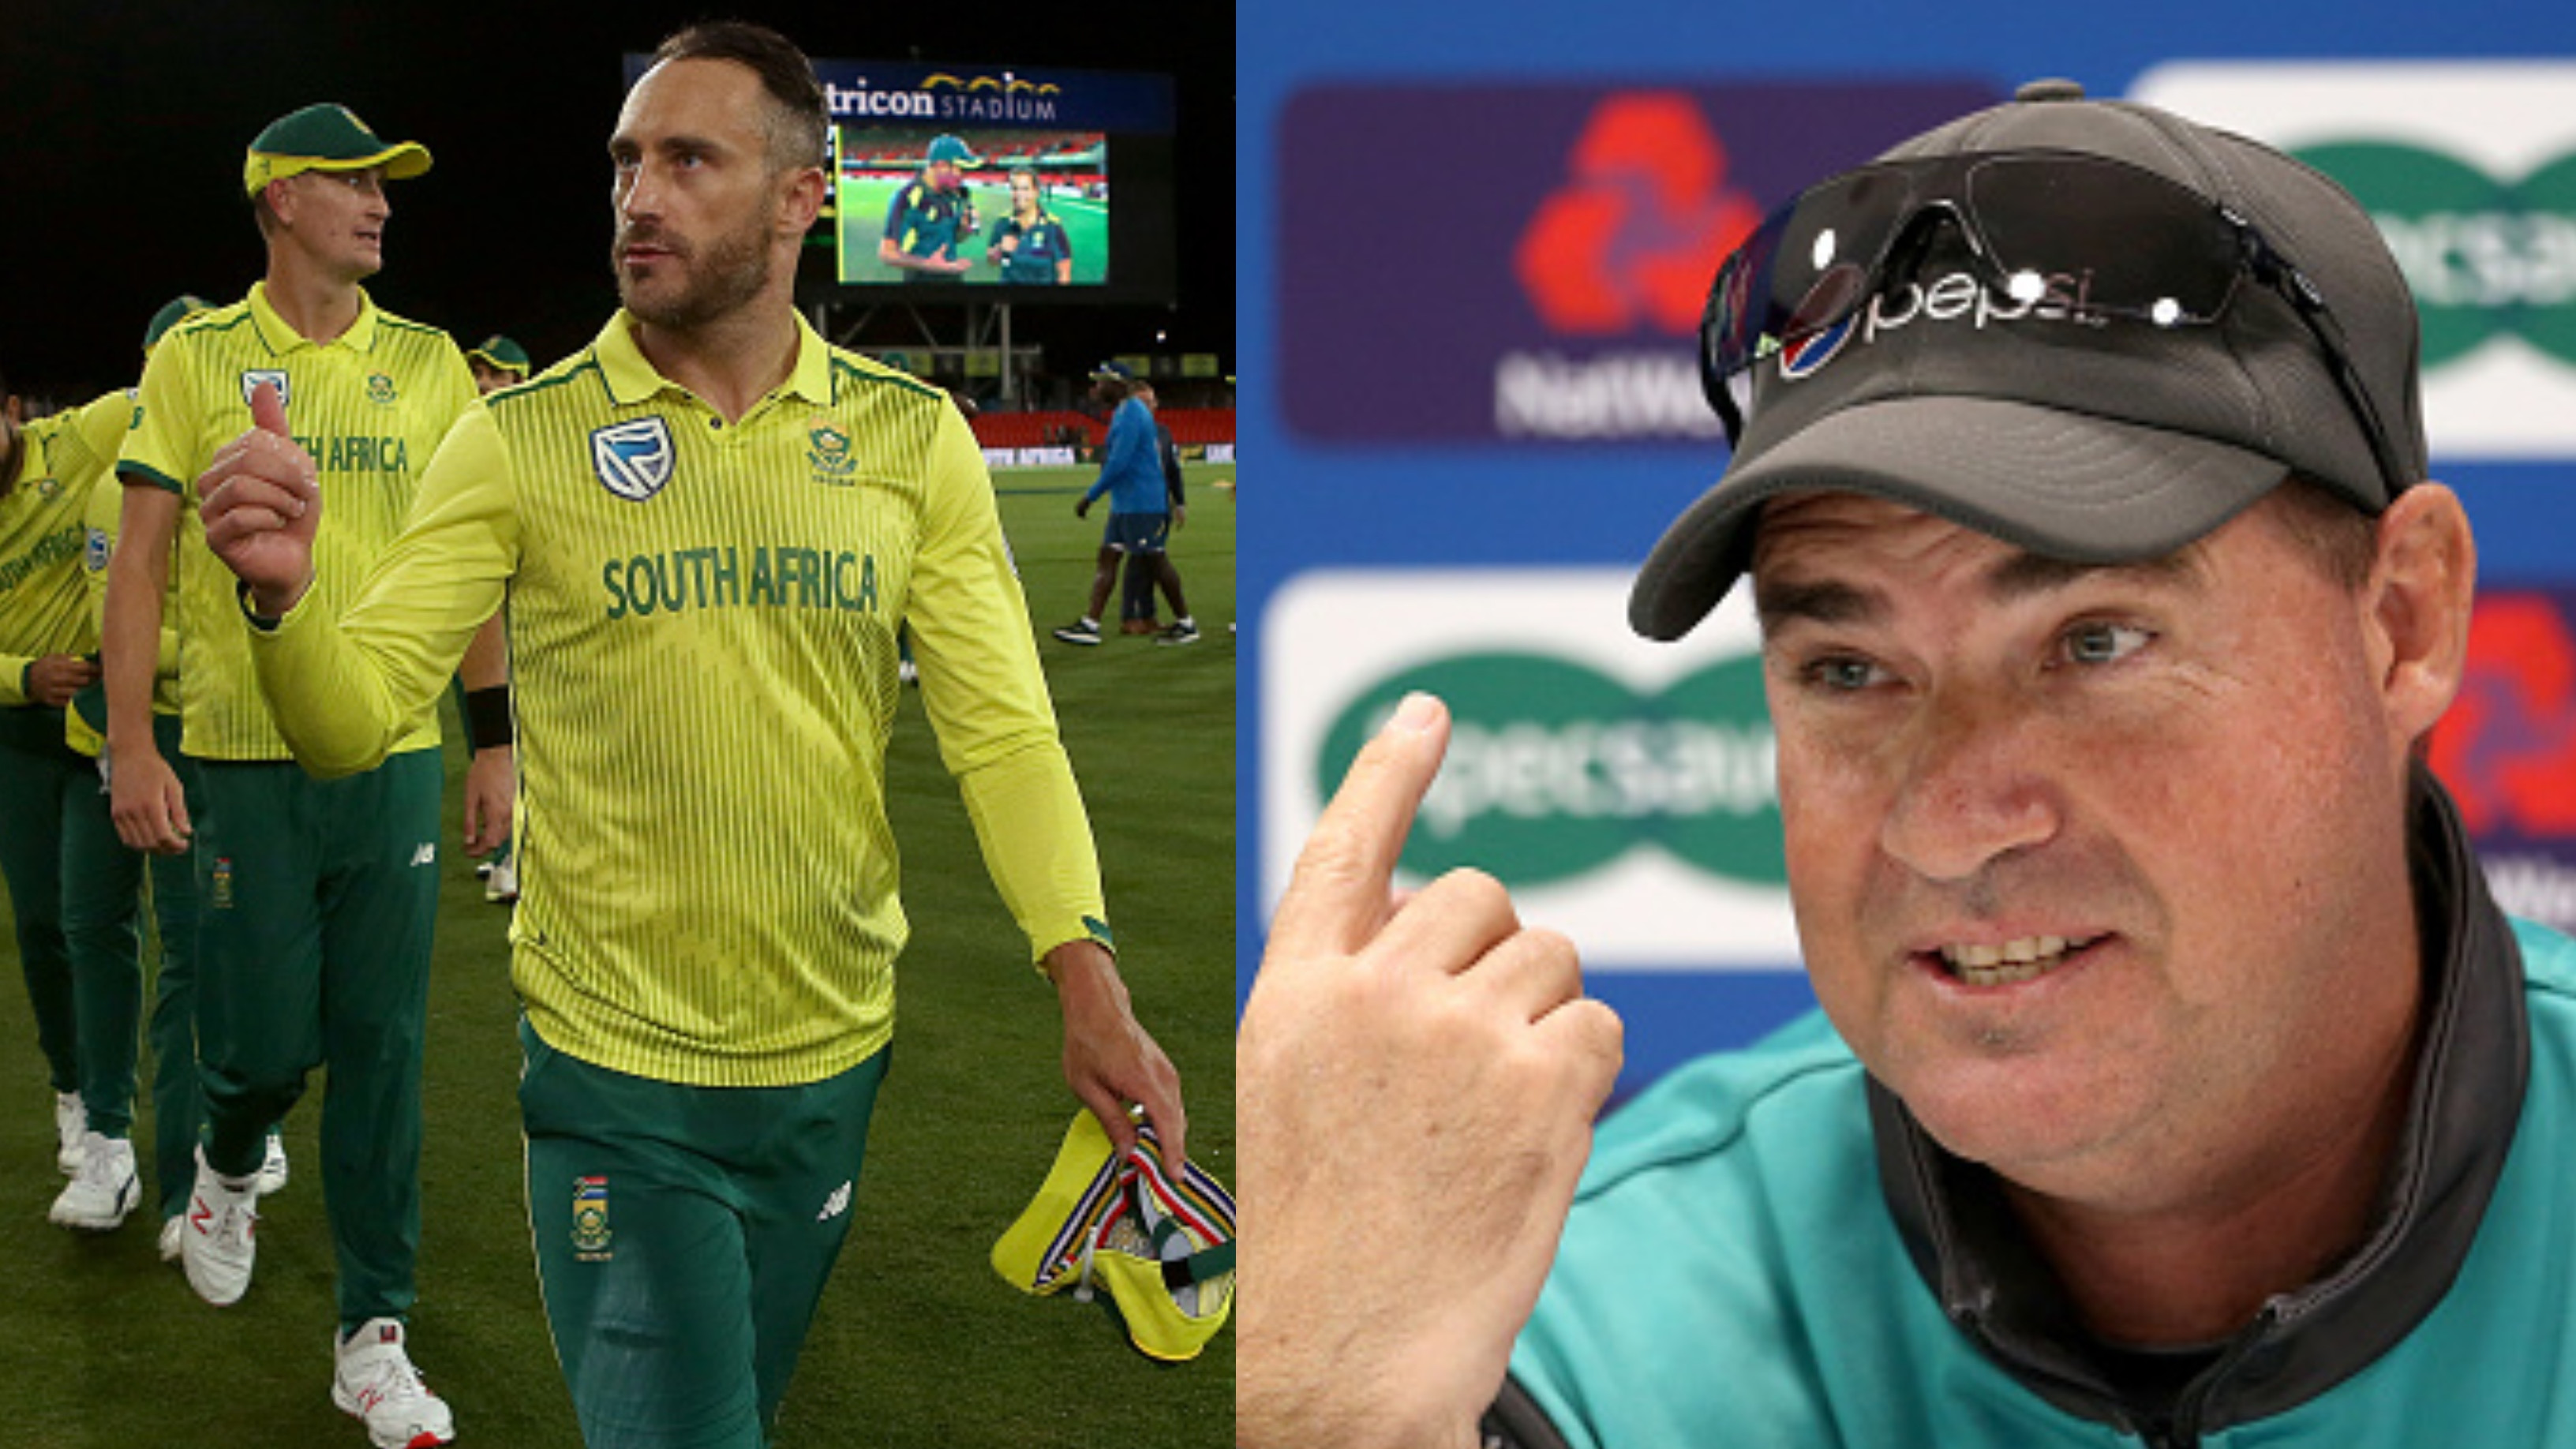 SA v PAK 2018-19: Mickey Arthur backs Pakistan to put South Africa under pressure